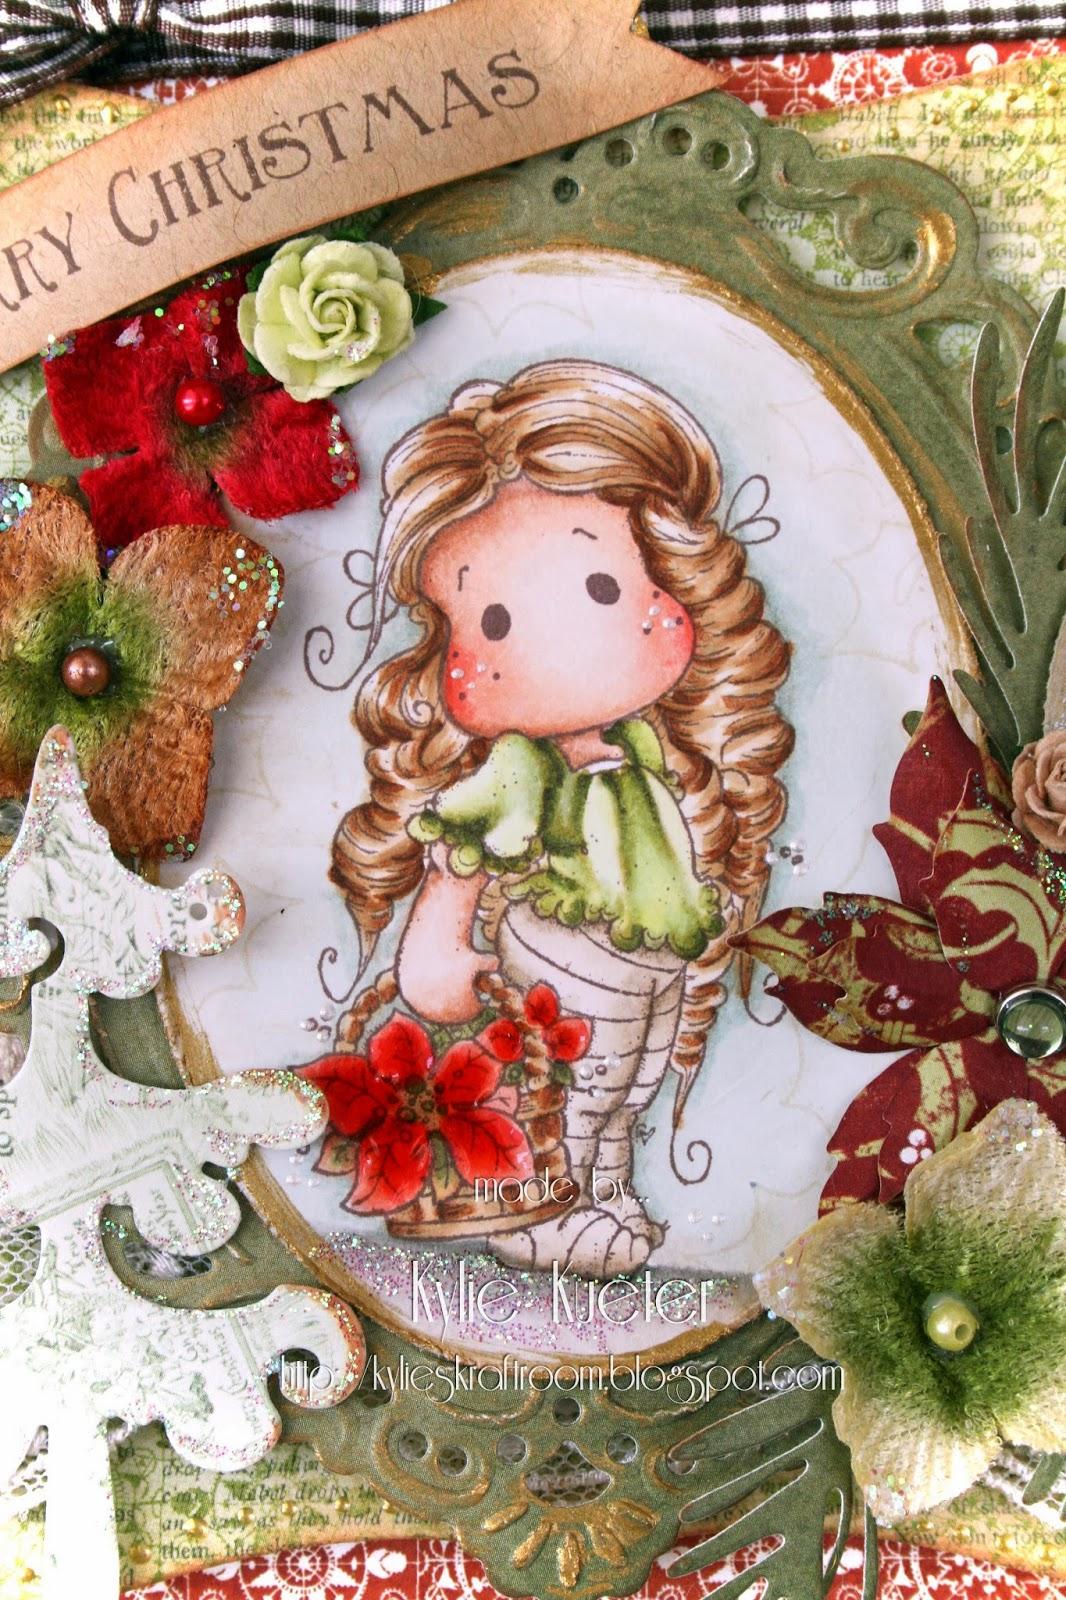 Kylie & Magnolia: Merry Christmas Tilda